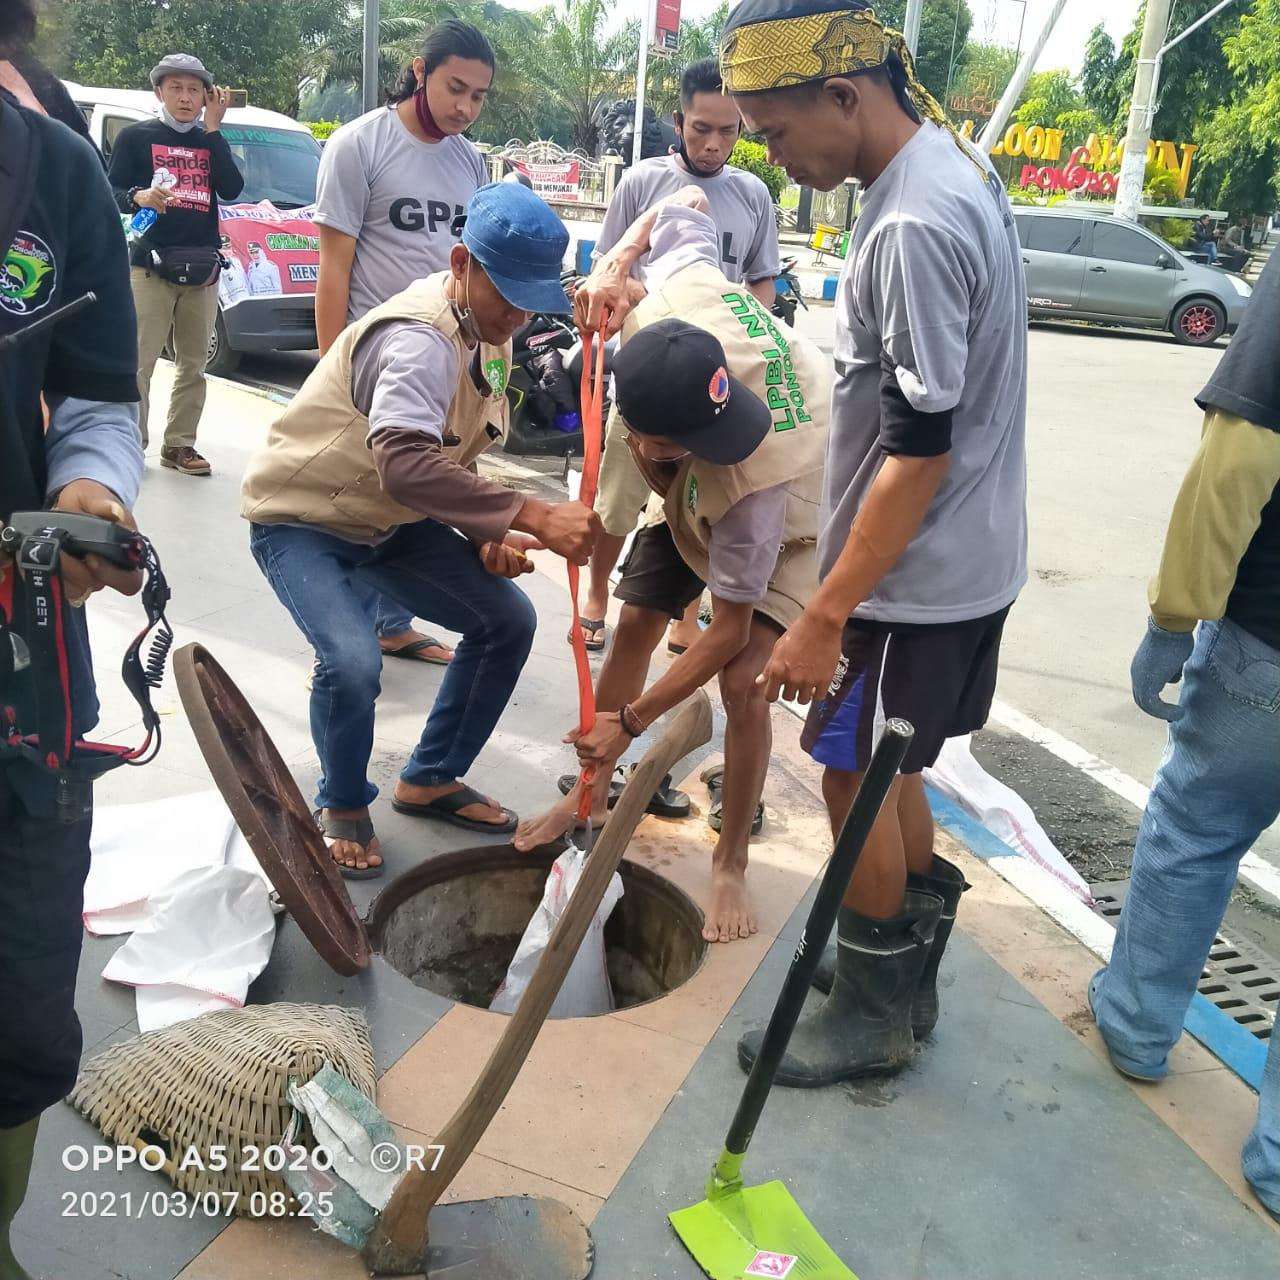 LPBI NU tergabung dengan relawan bersih- bersih sampah dan gorong-gorong air di tengah kota